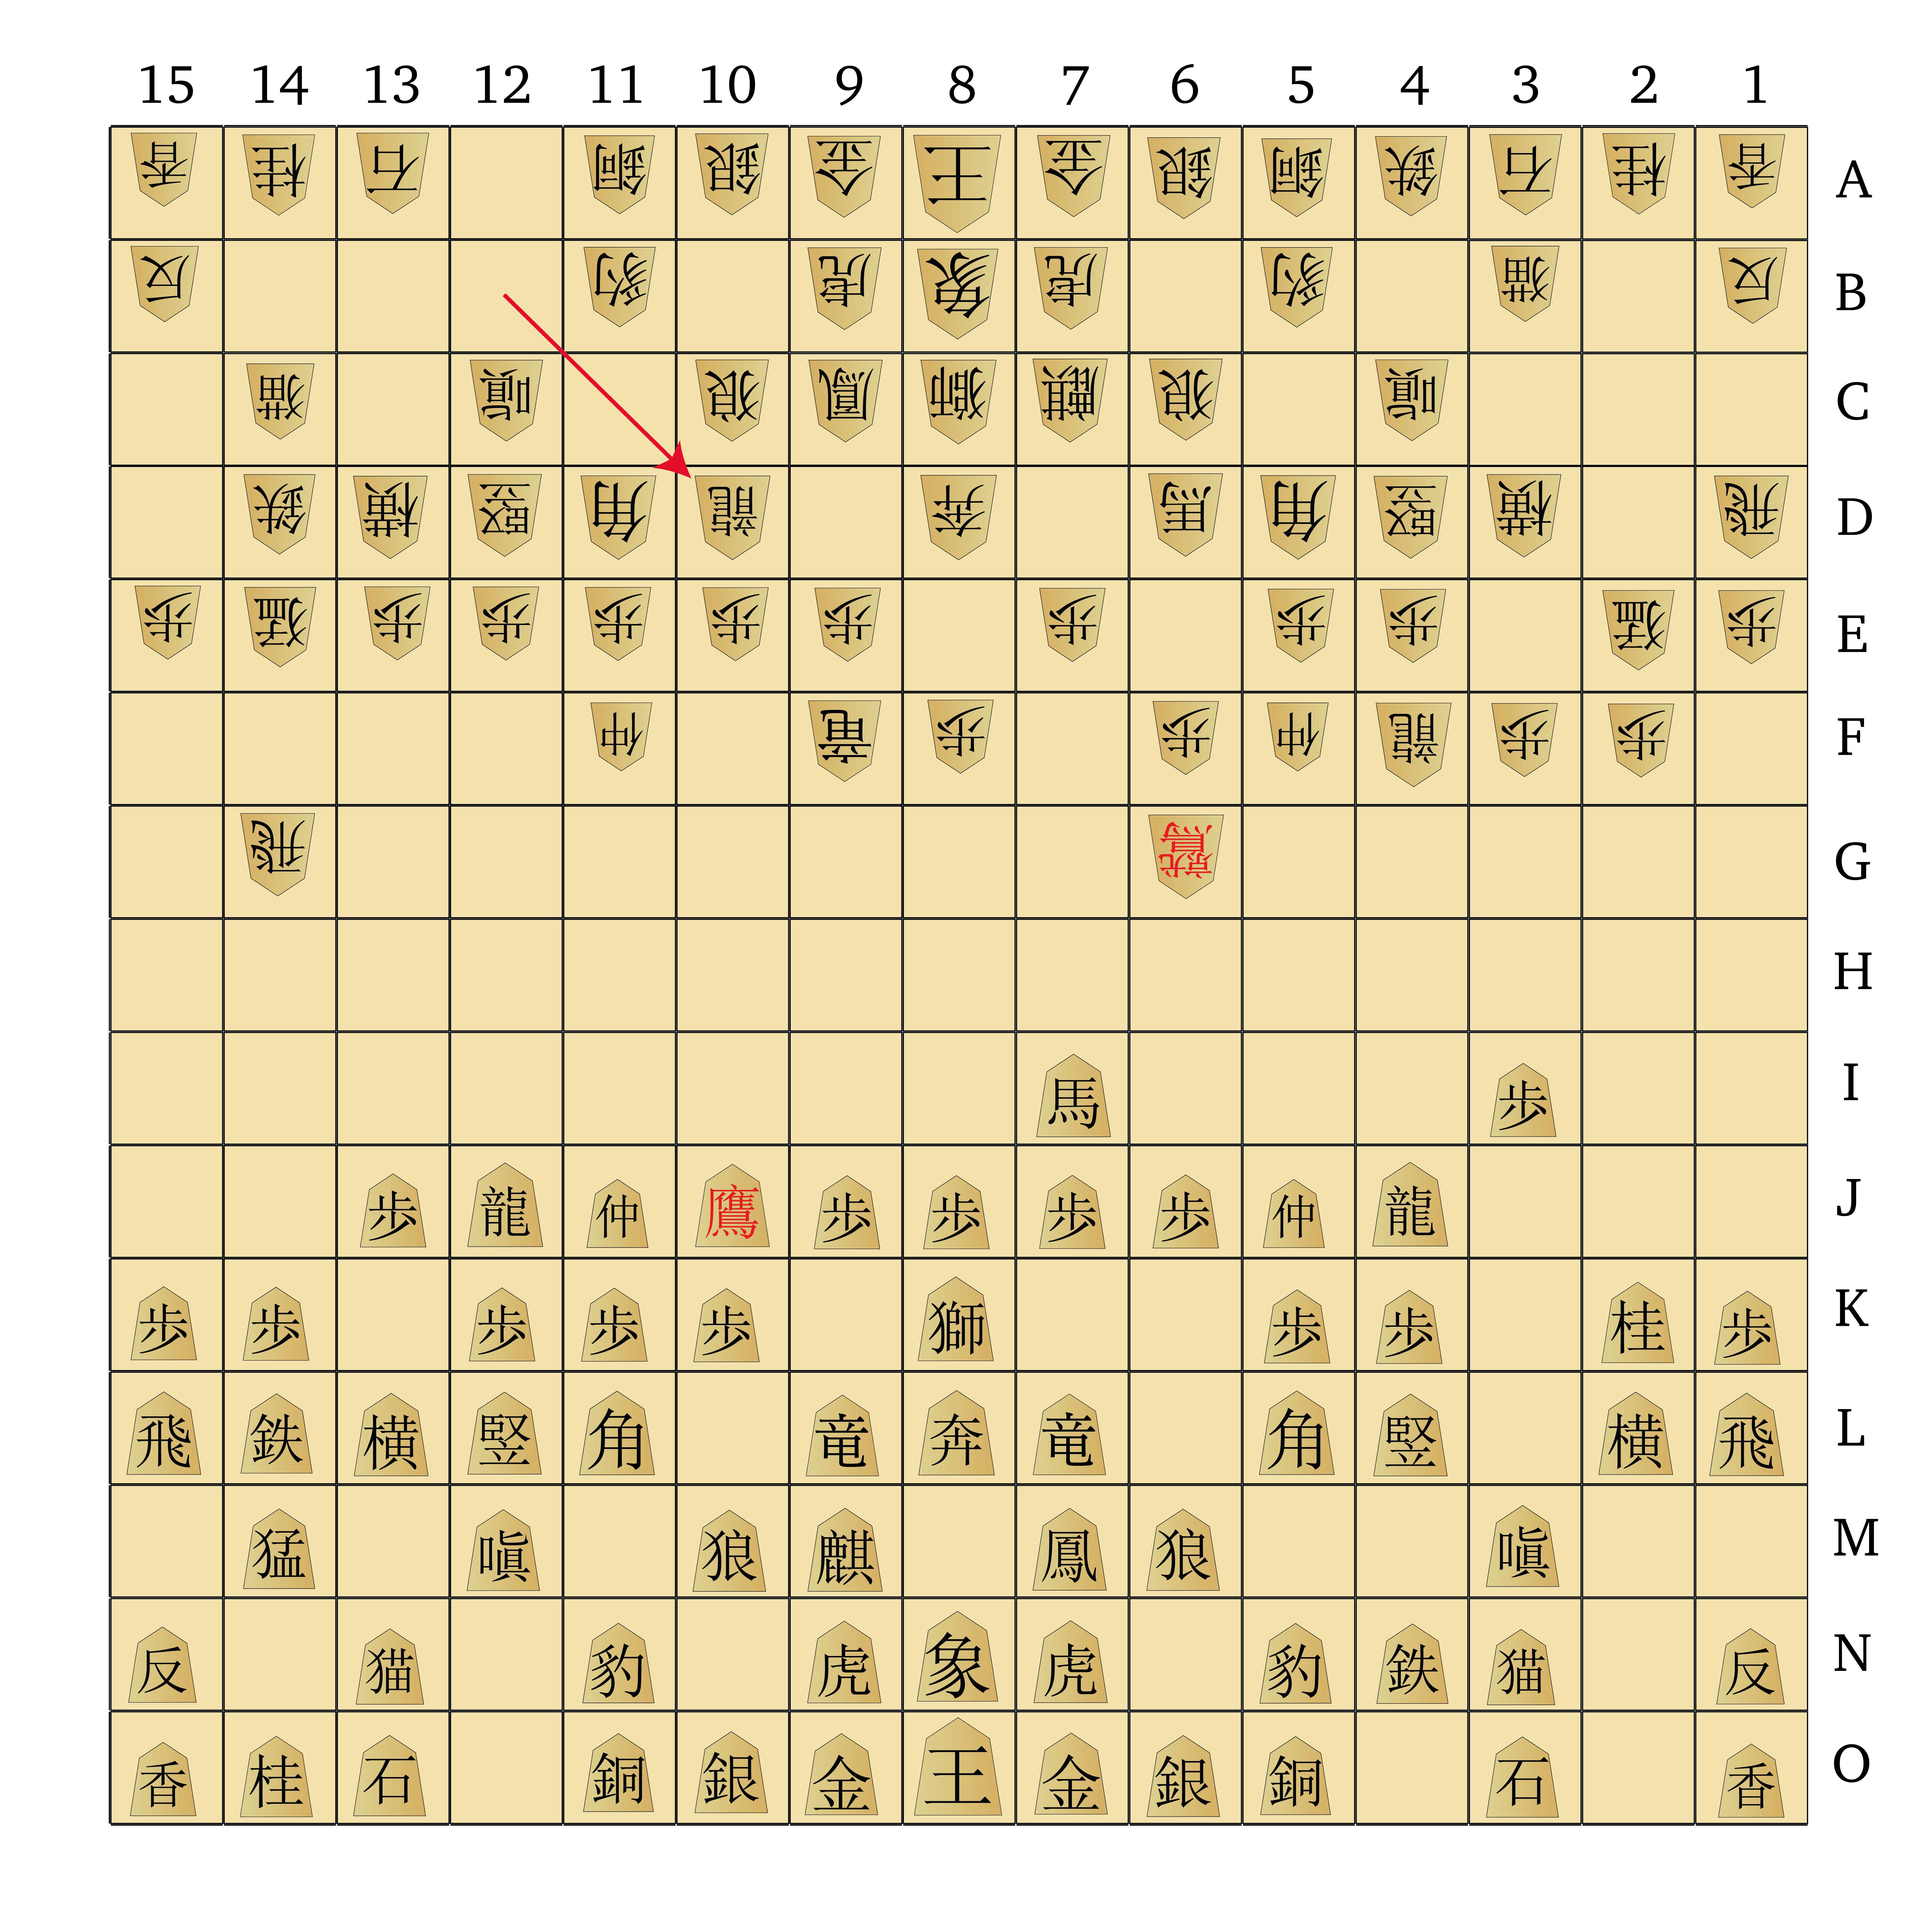 Dai Shogi 420 -- Move 50-01